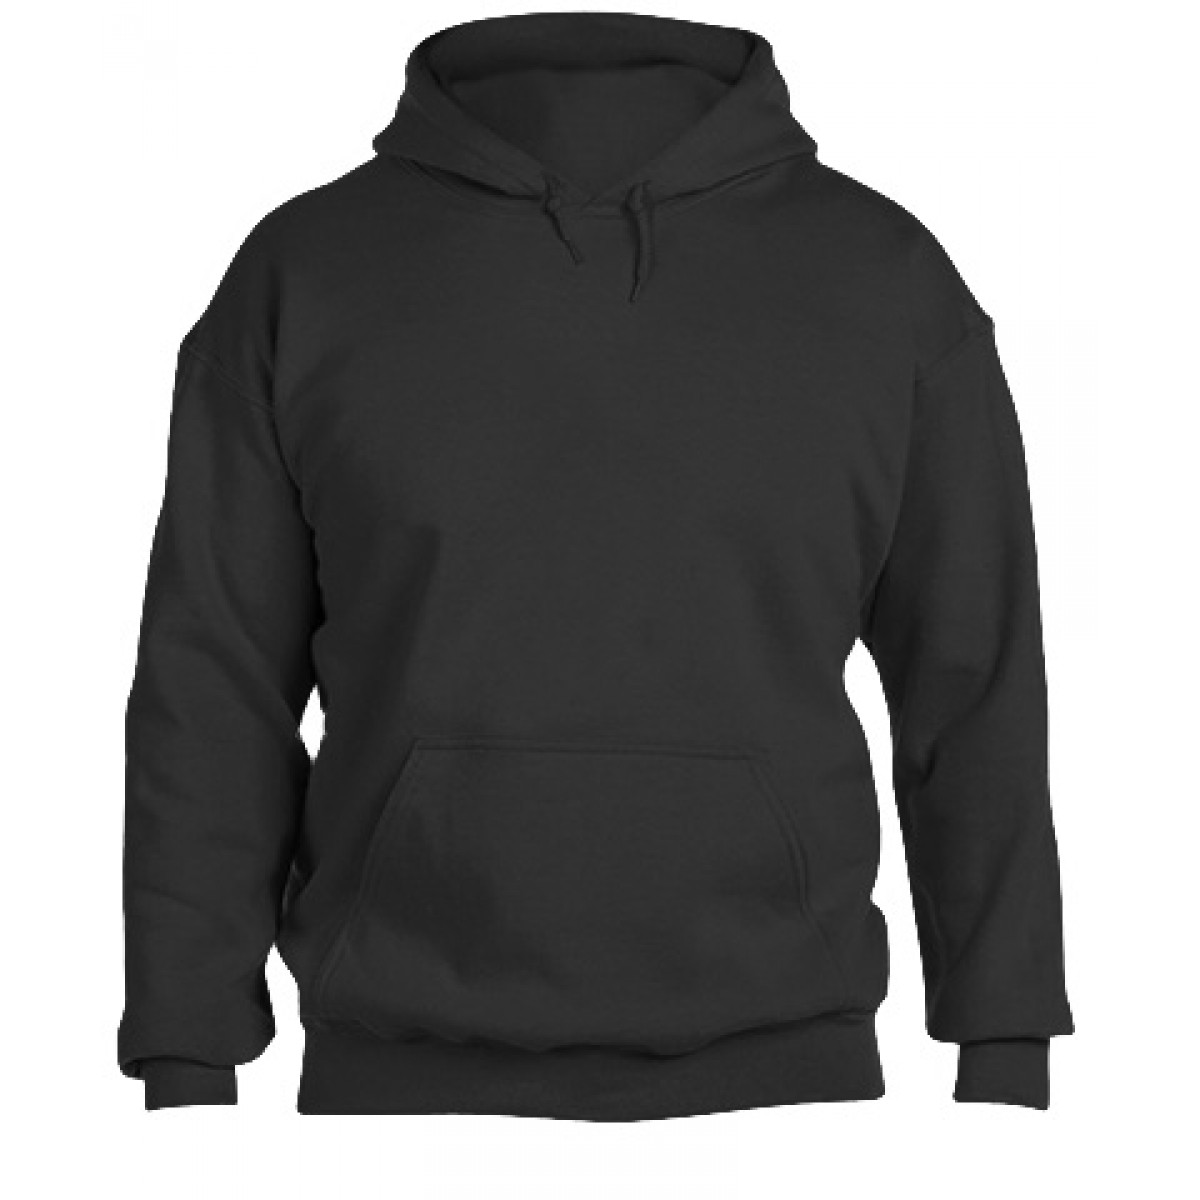 Solid Hooded Sweatshirt  50/50 Heavy Blend-Black-2XL